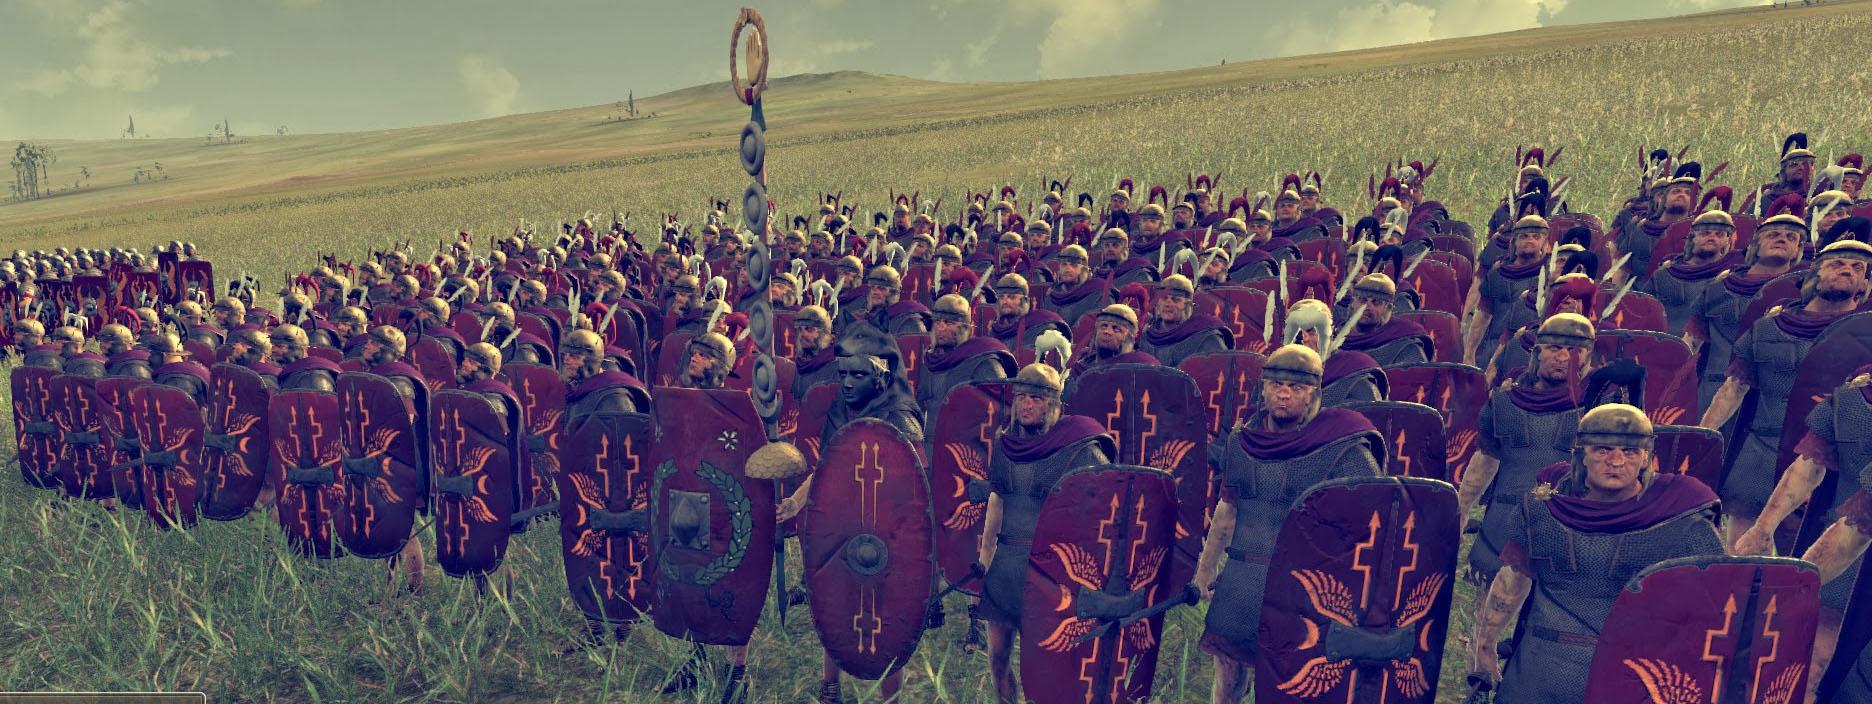 Praetorians (Total War: Rome II)   Total War Wiki   FANDOM ...